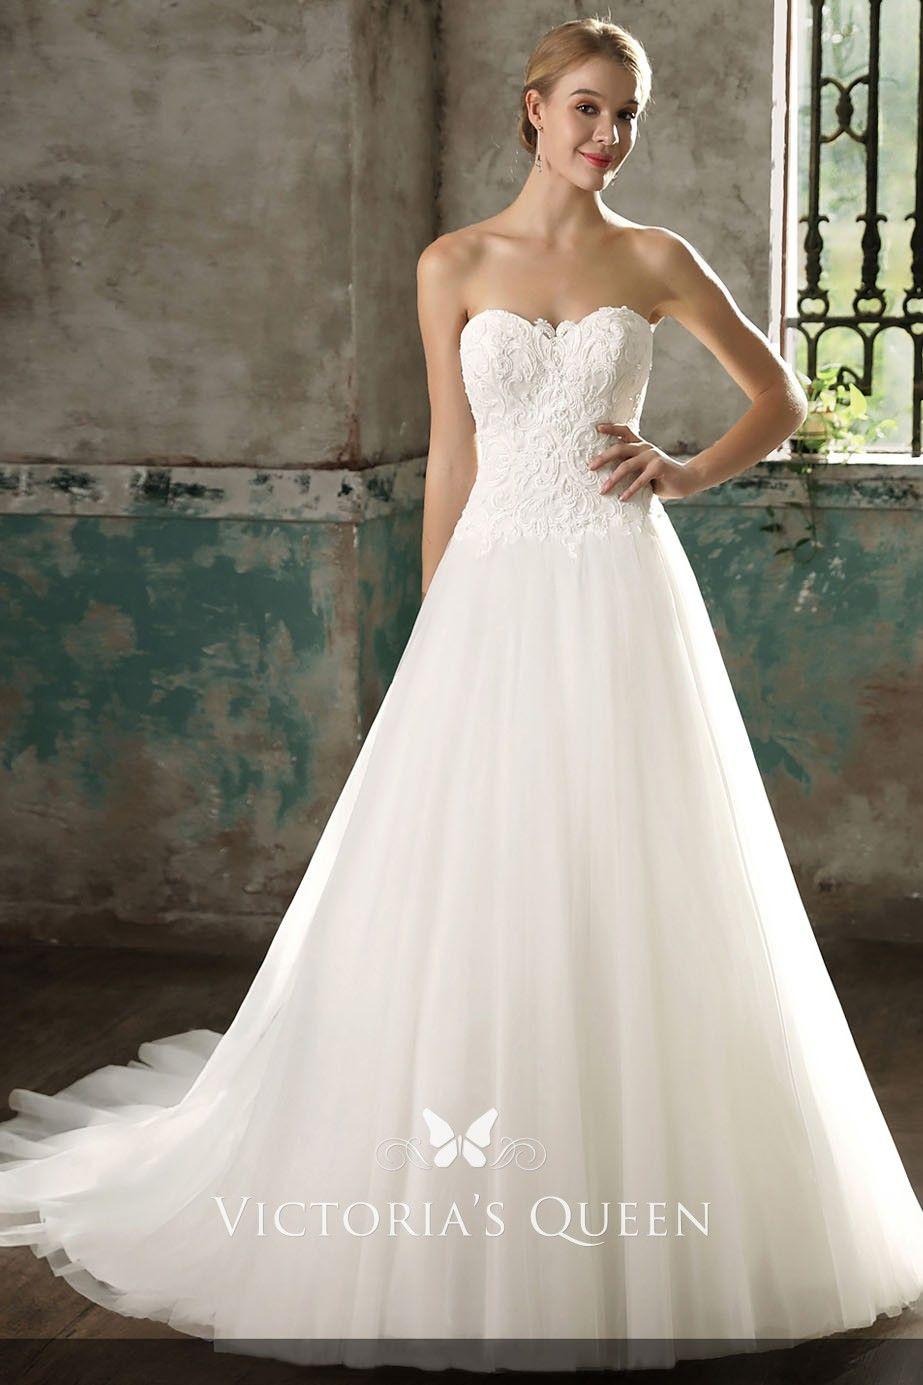 Ivory Sweetheart Neckline Wedding Dresses